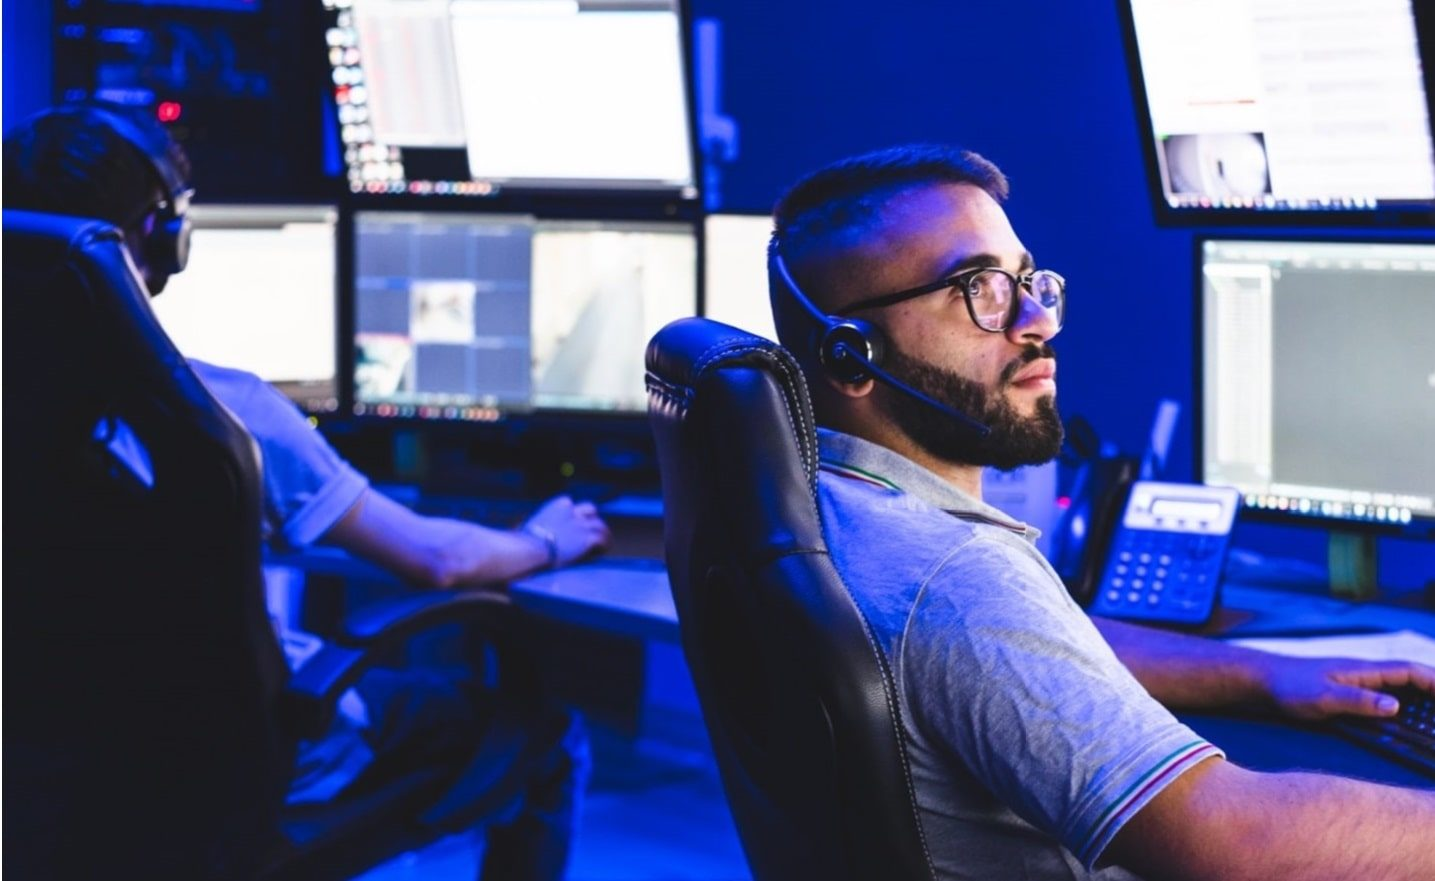 Help Desk panoramica a due postazioni